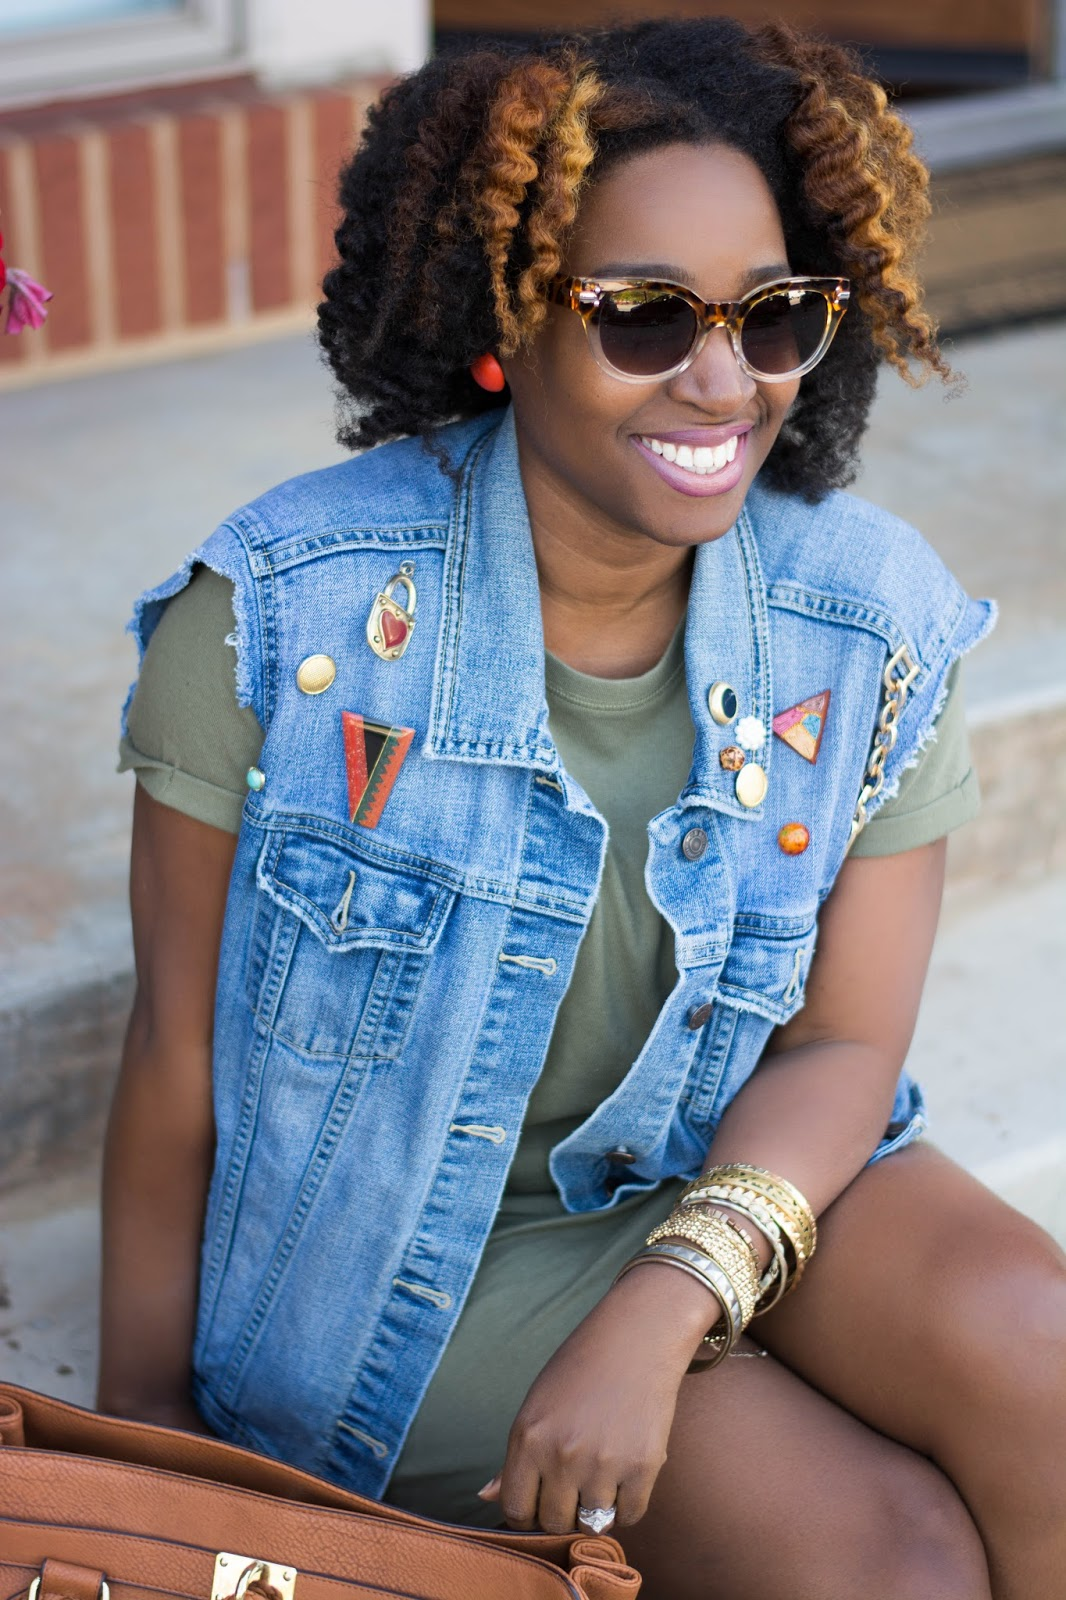 Atlanta stylist, Atlanta blogger, Style blogger, Black blogger, Black girls killing it, Black girls rock, Forever21, Booties, Handbag, T-Shirt dress, Denim vest, Diy street fashion, Brown girls, Natural Hair, Shoedazzle, Olive shirt dress, Summerwear, Springwear